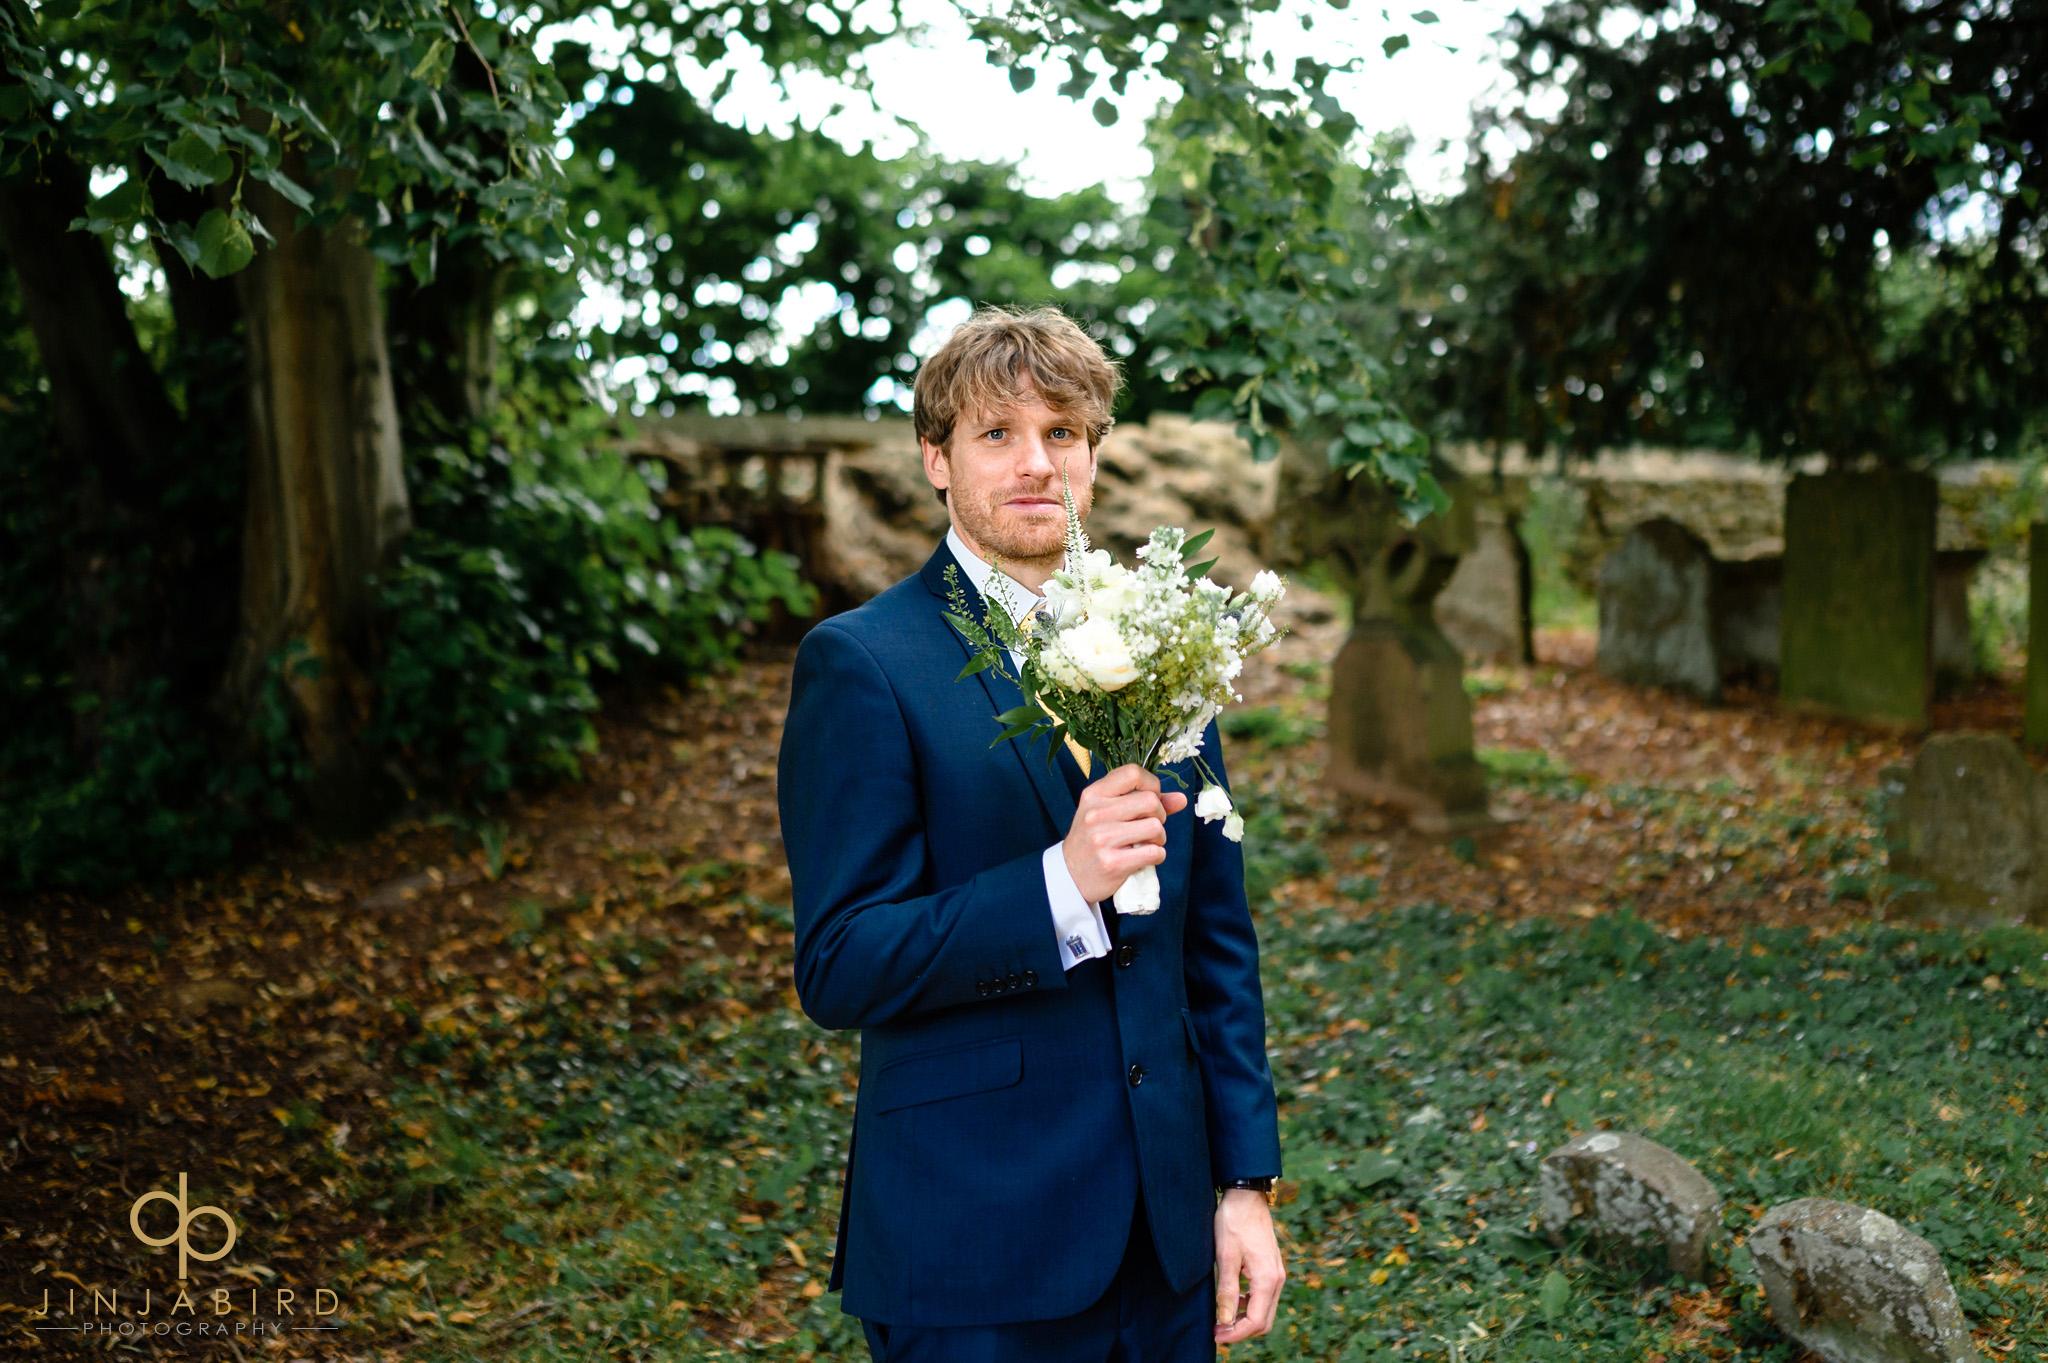 best man holding bouquet